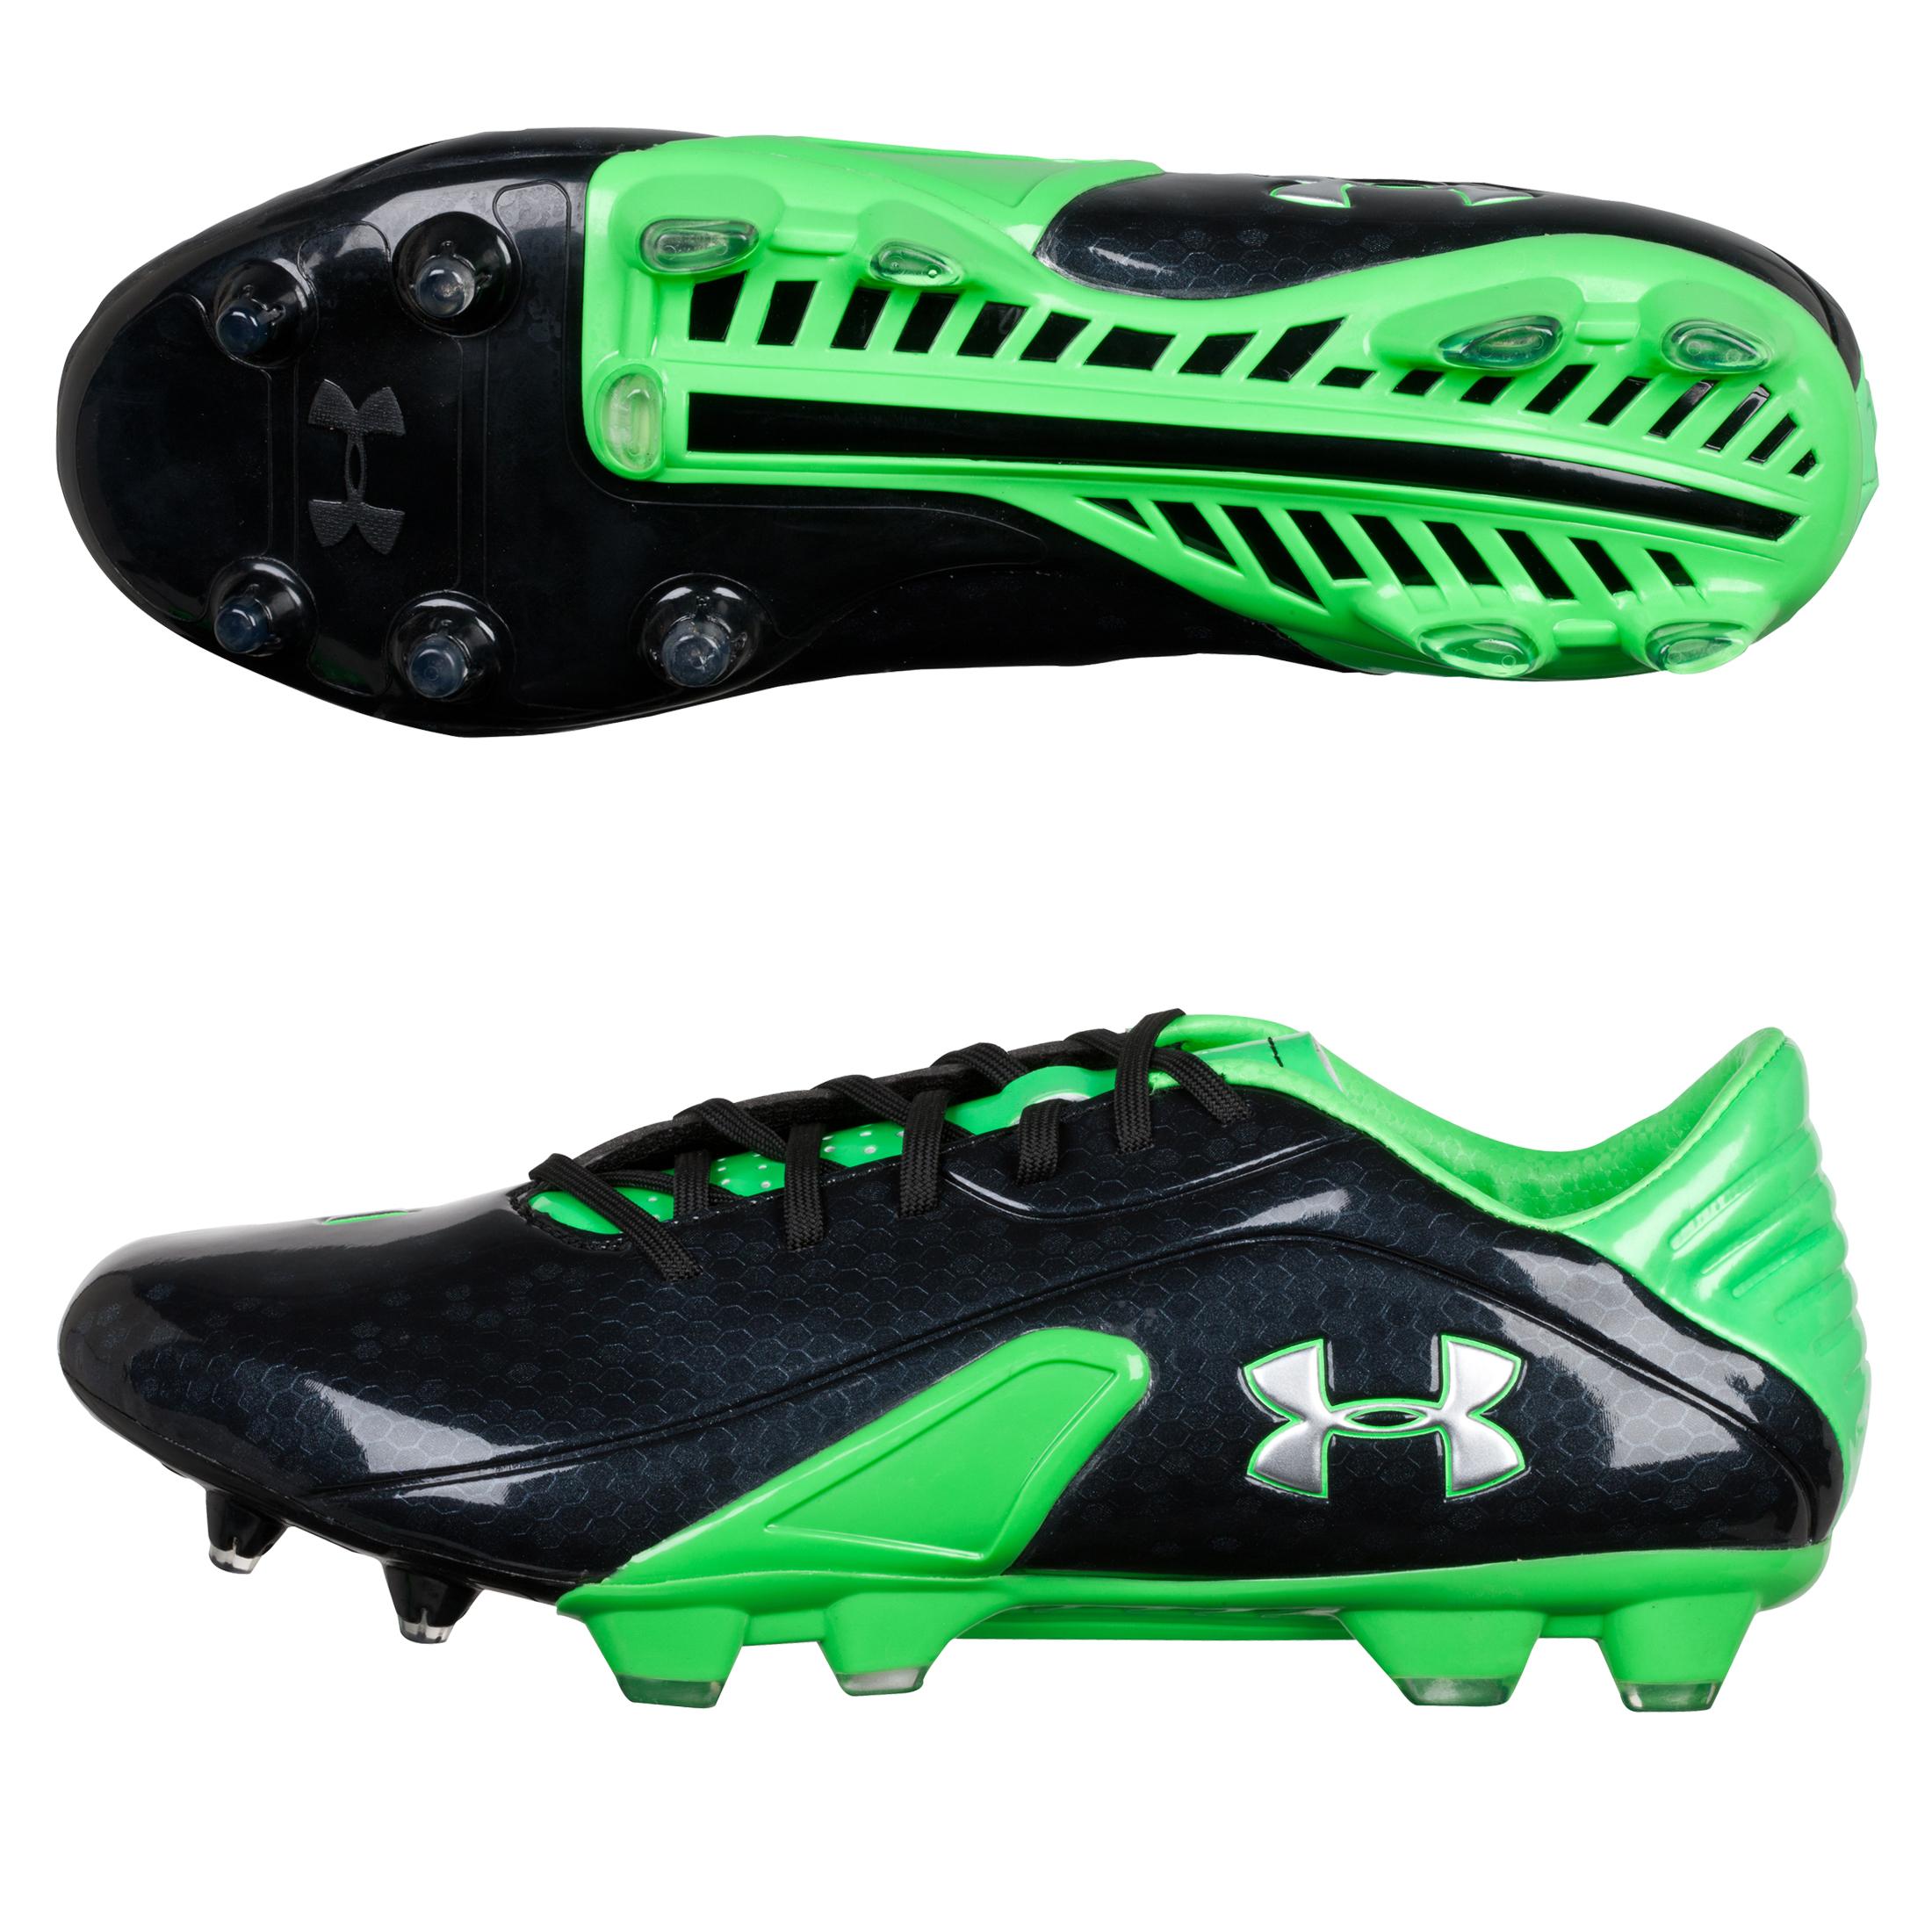 Under Armour Spine Blur Firm Ground Football Boots - Black/Poison/Metallic Silver